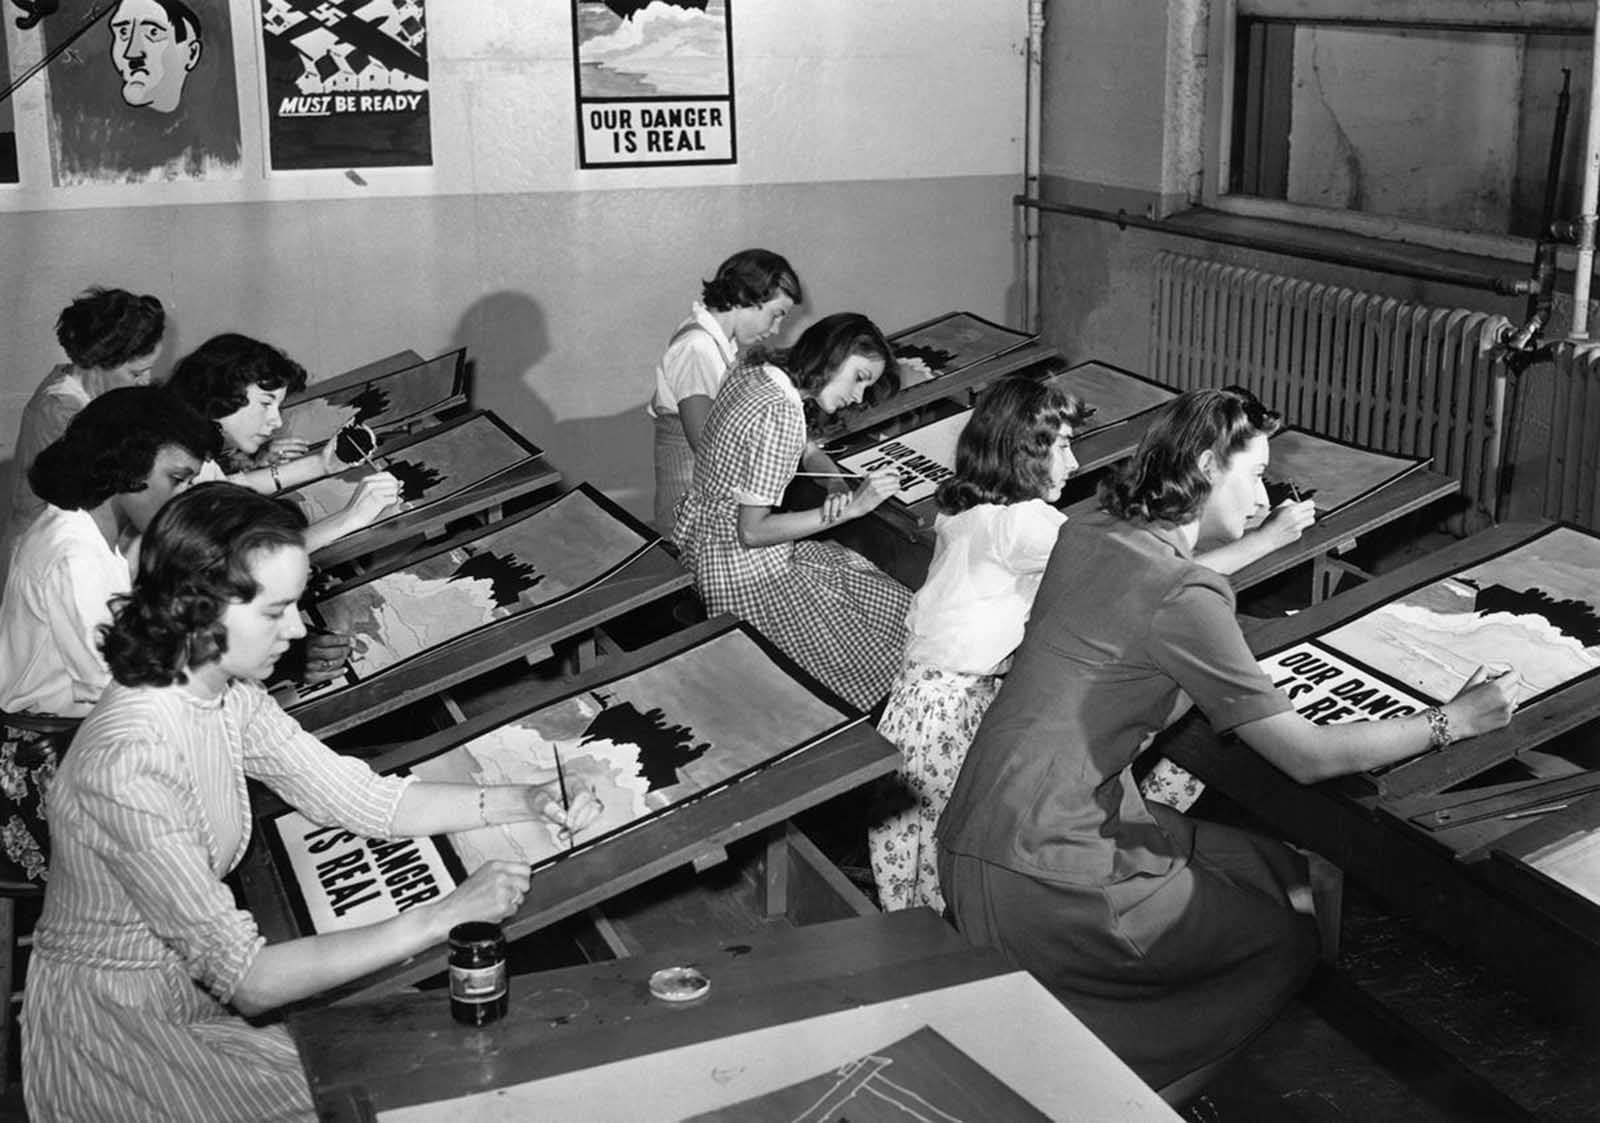 8 юли 1942 г., Порт Вашингтон, Ню Йорк: Жени рисуват германски пропагандни постери.